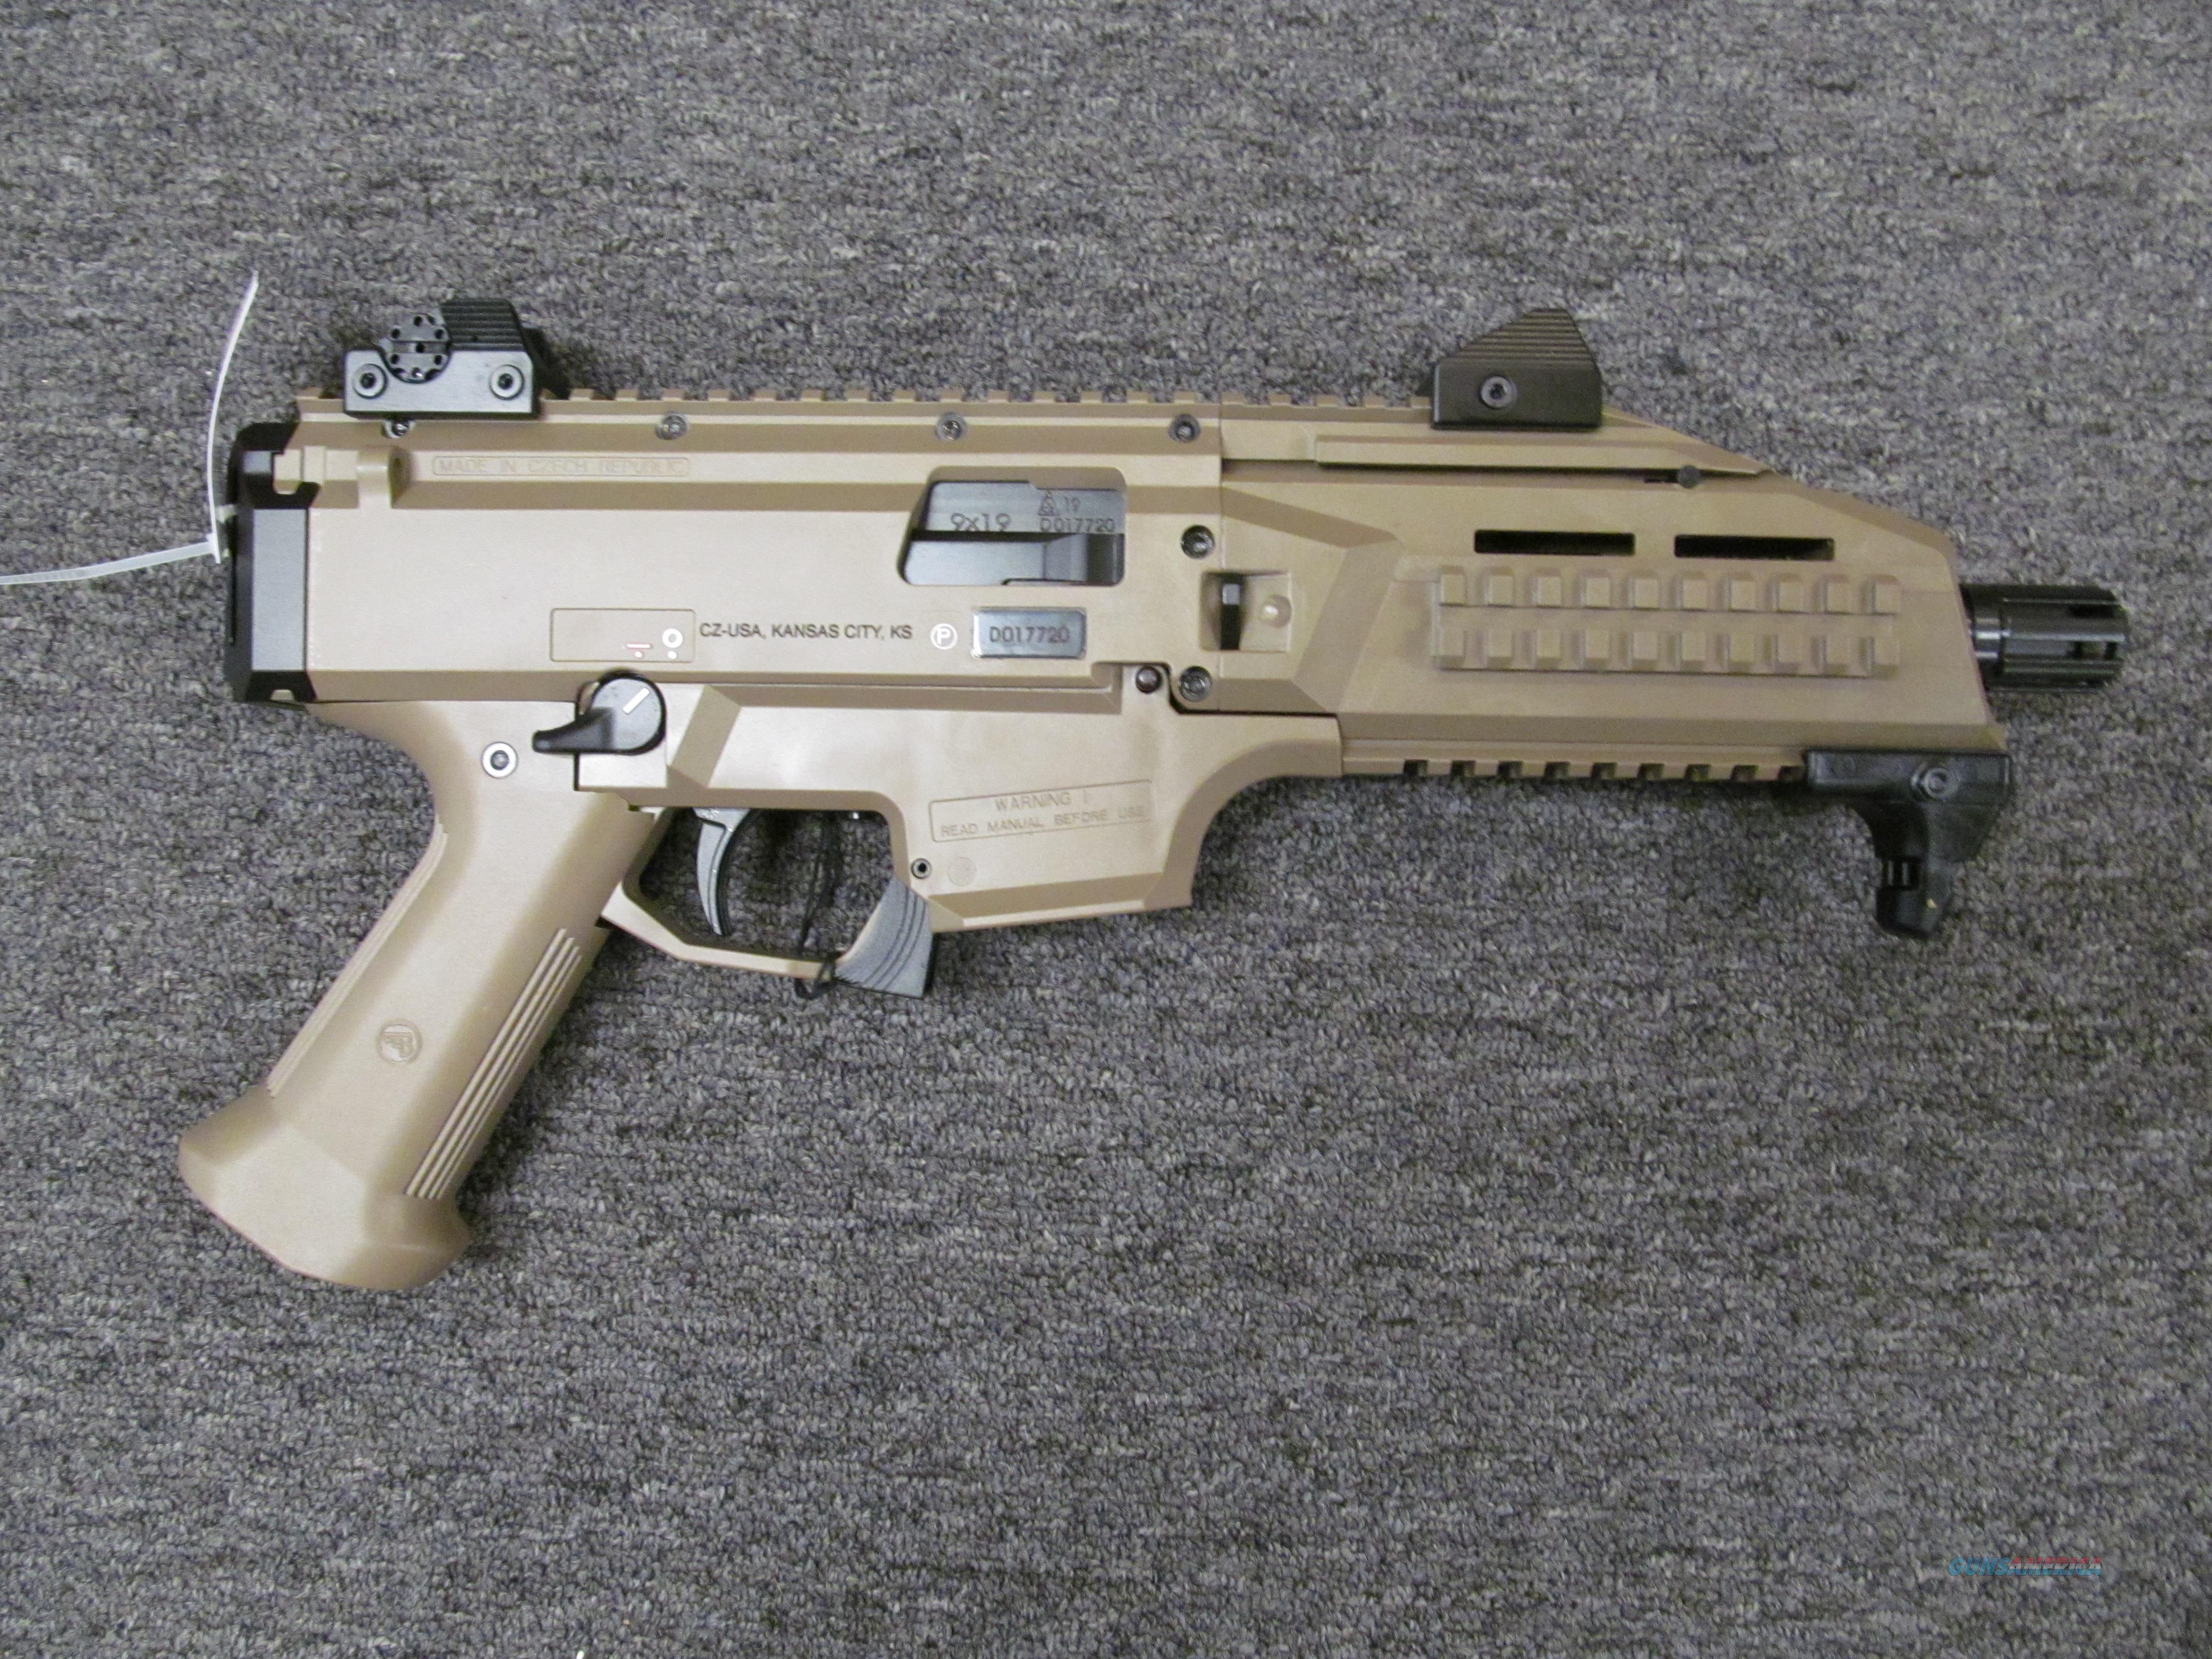 CZ Scorpion Evo 3 S1 (91352) w/FDE Finish  Guns > Pistols > CZ Pistols